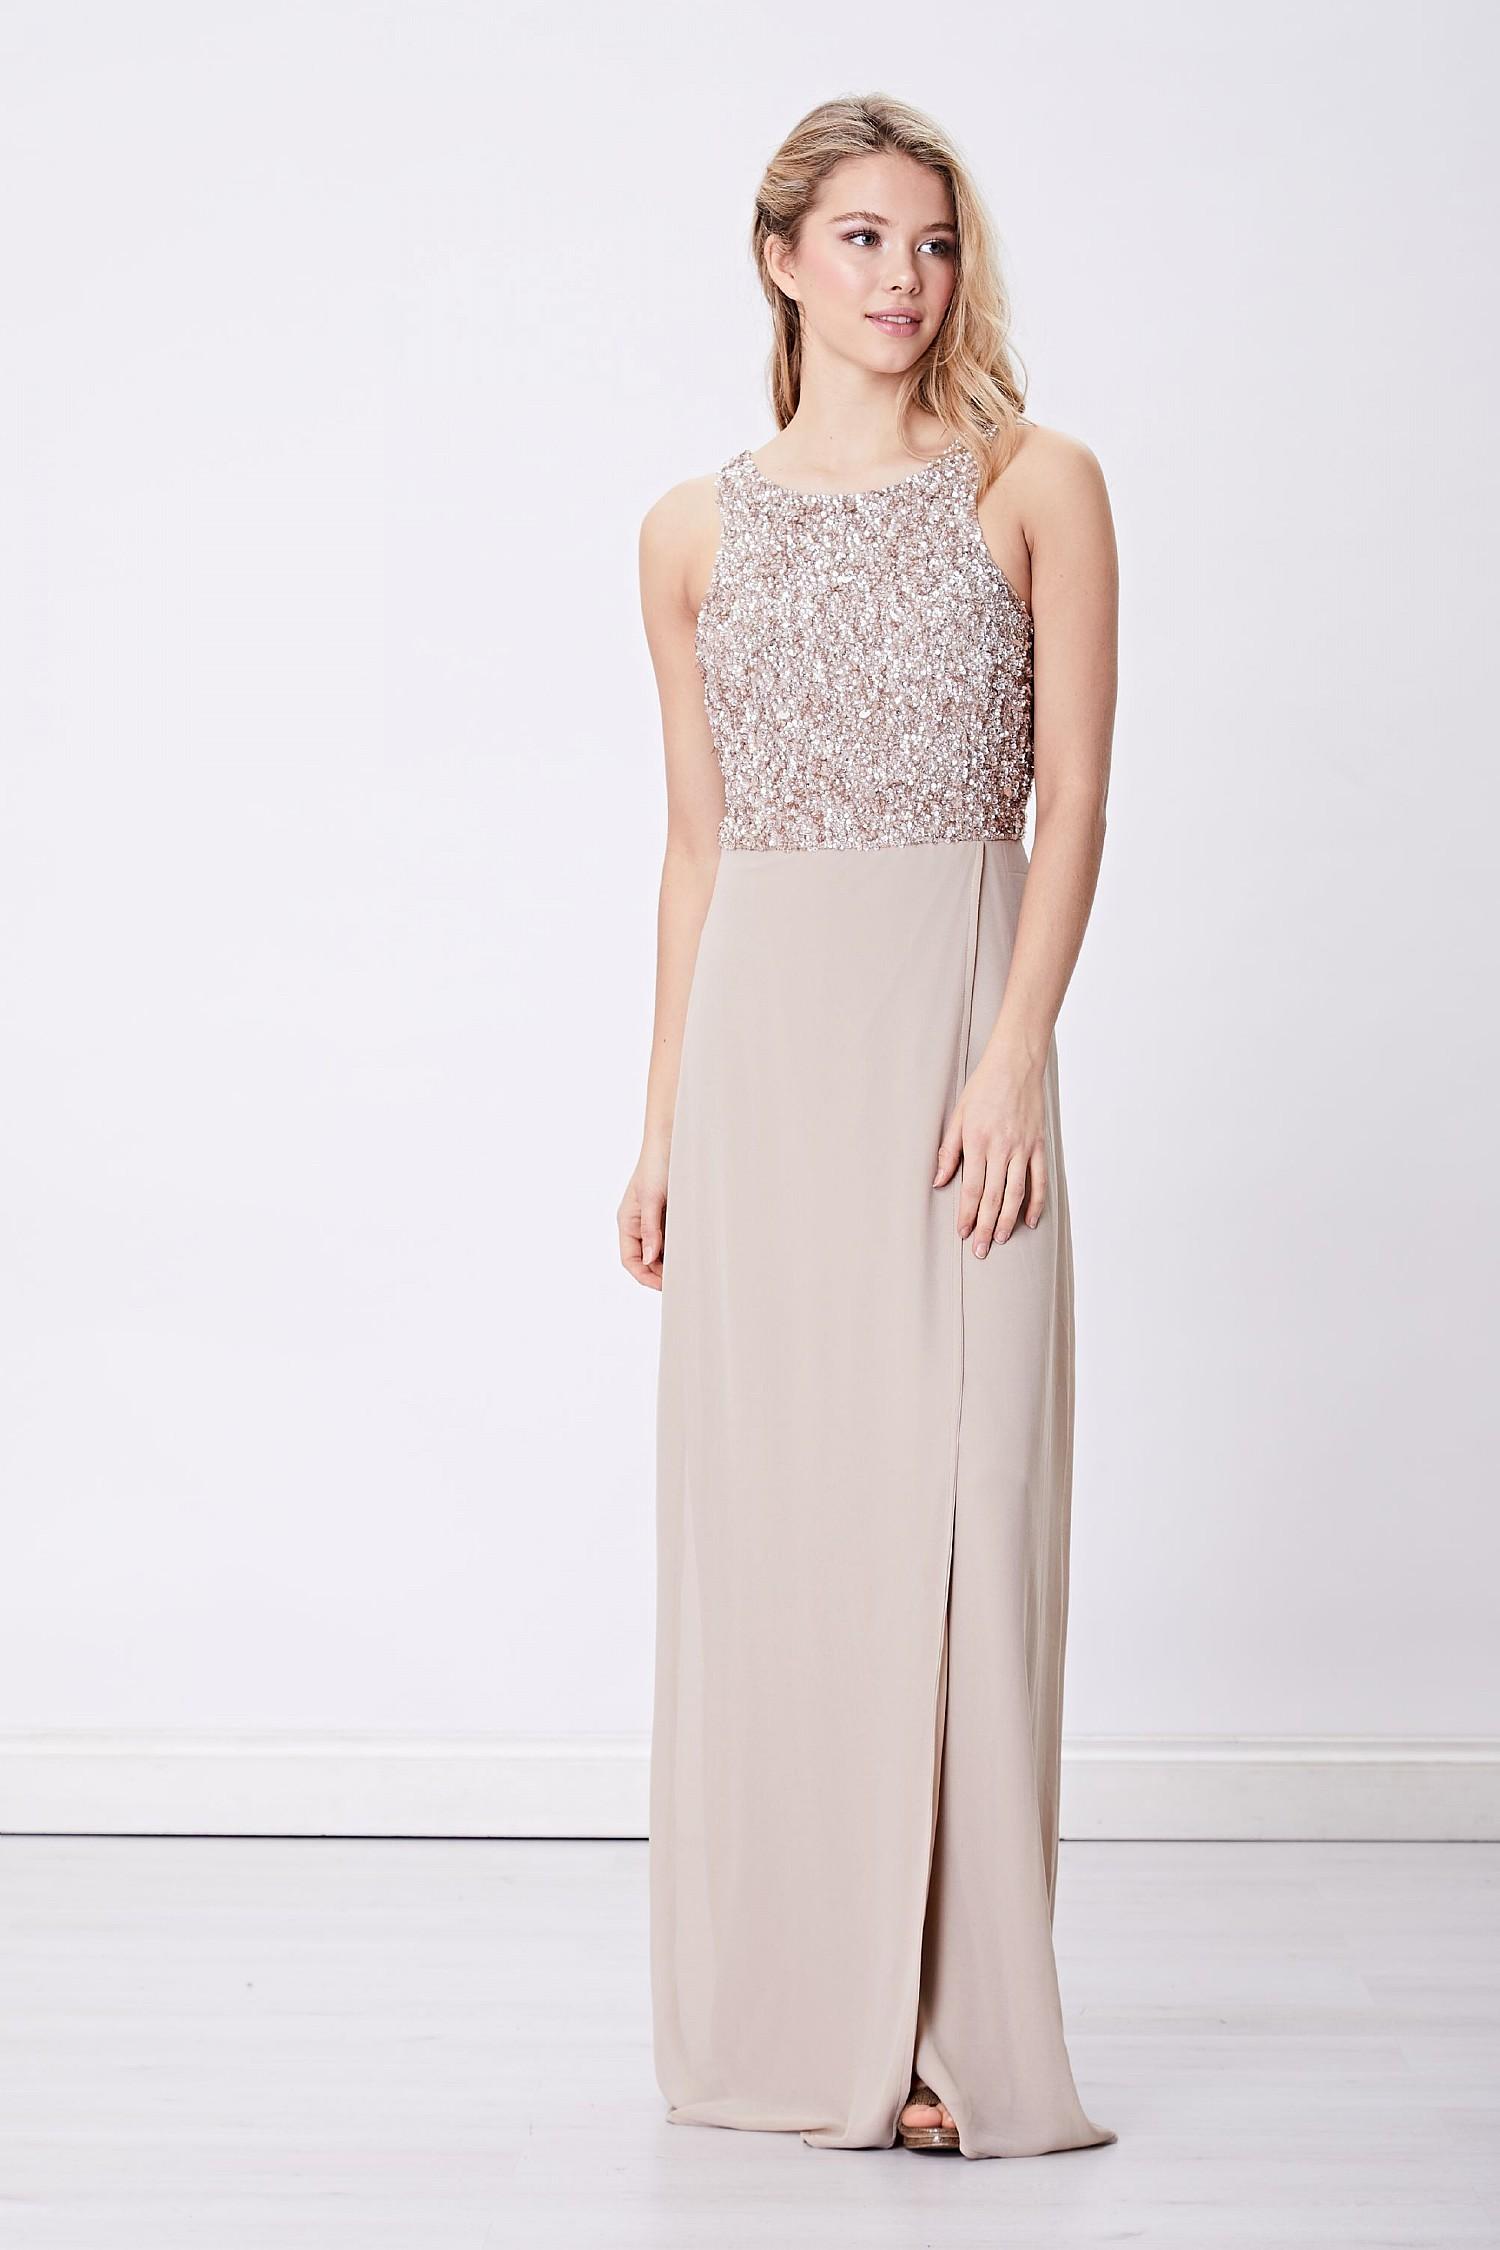 bc379244a8d0 Nude Beige Embellished Maxi Dress with Side Slit